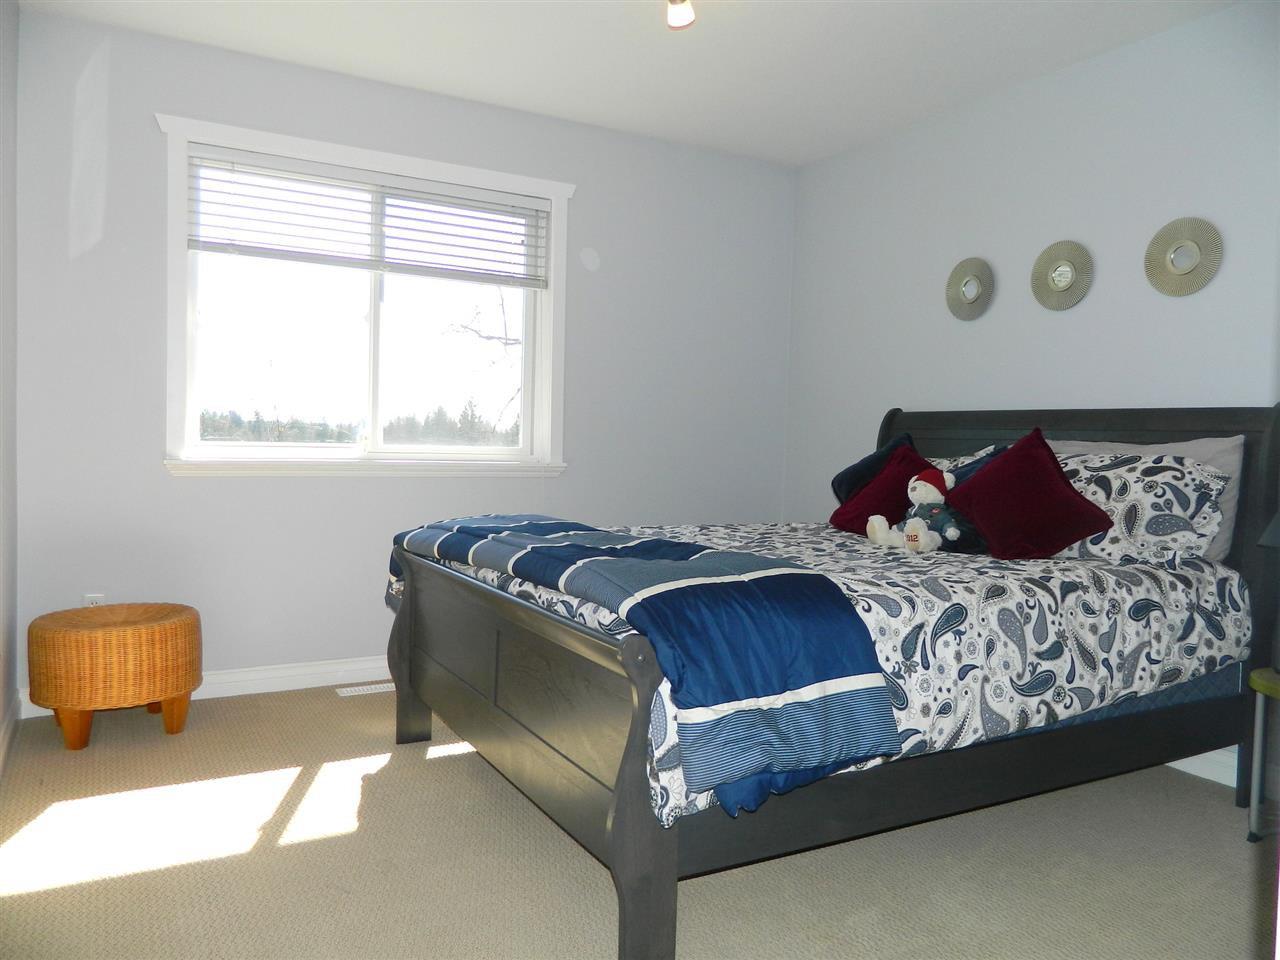 Photo 14: Photos: 24332 104 AVENUE in Maple Ridge: Albion House for sale : MLS®# R2051414